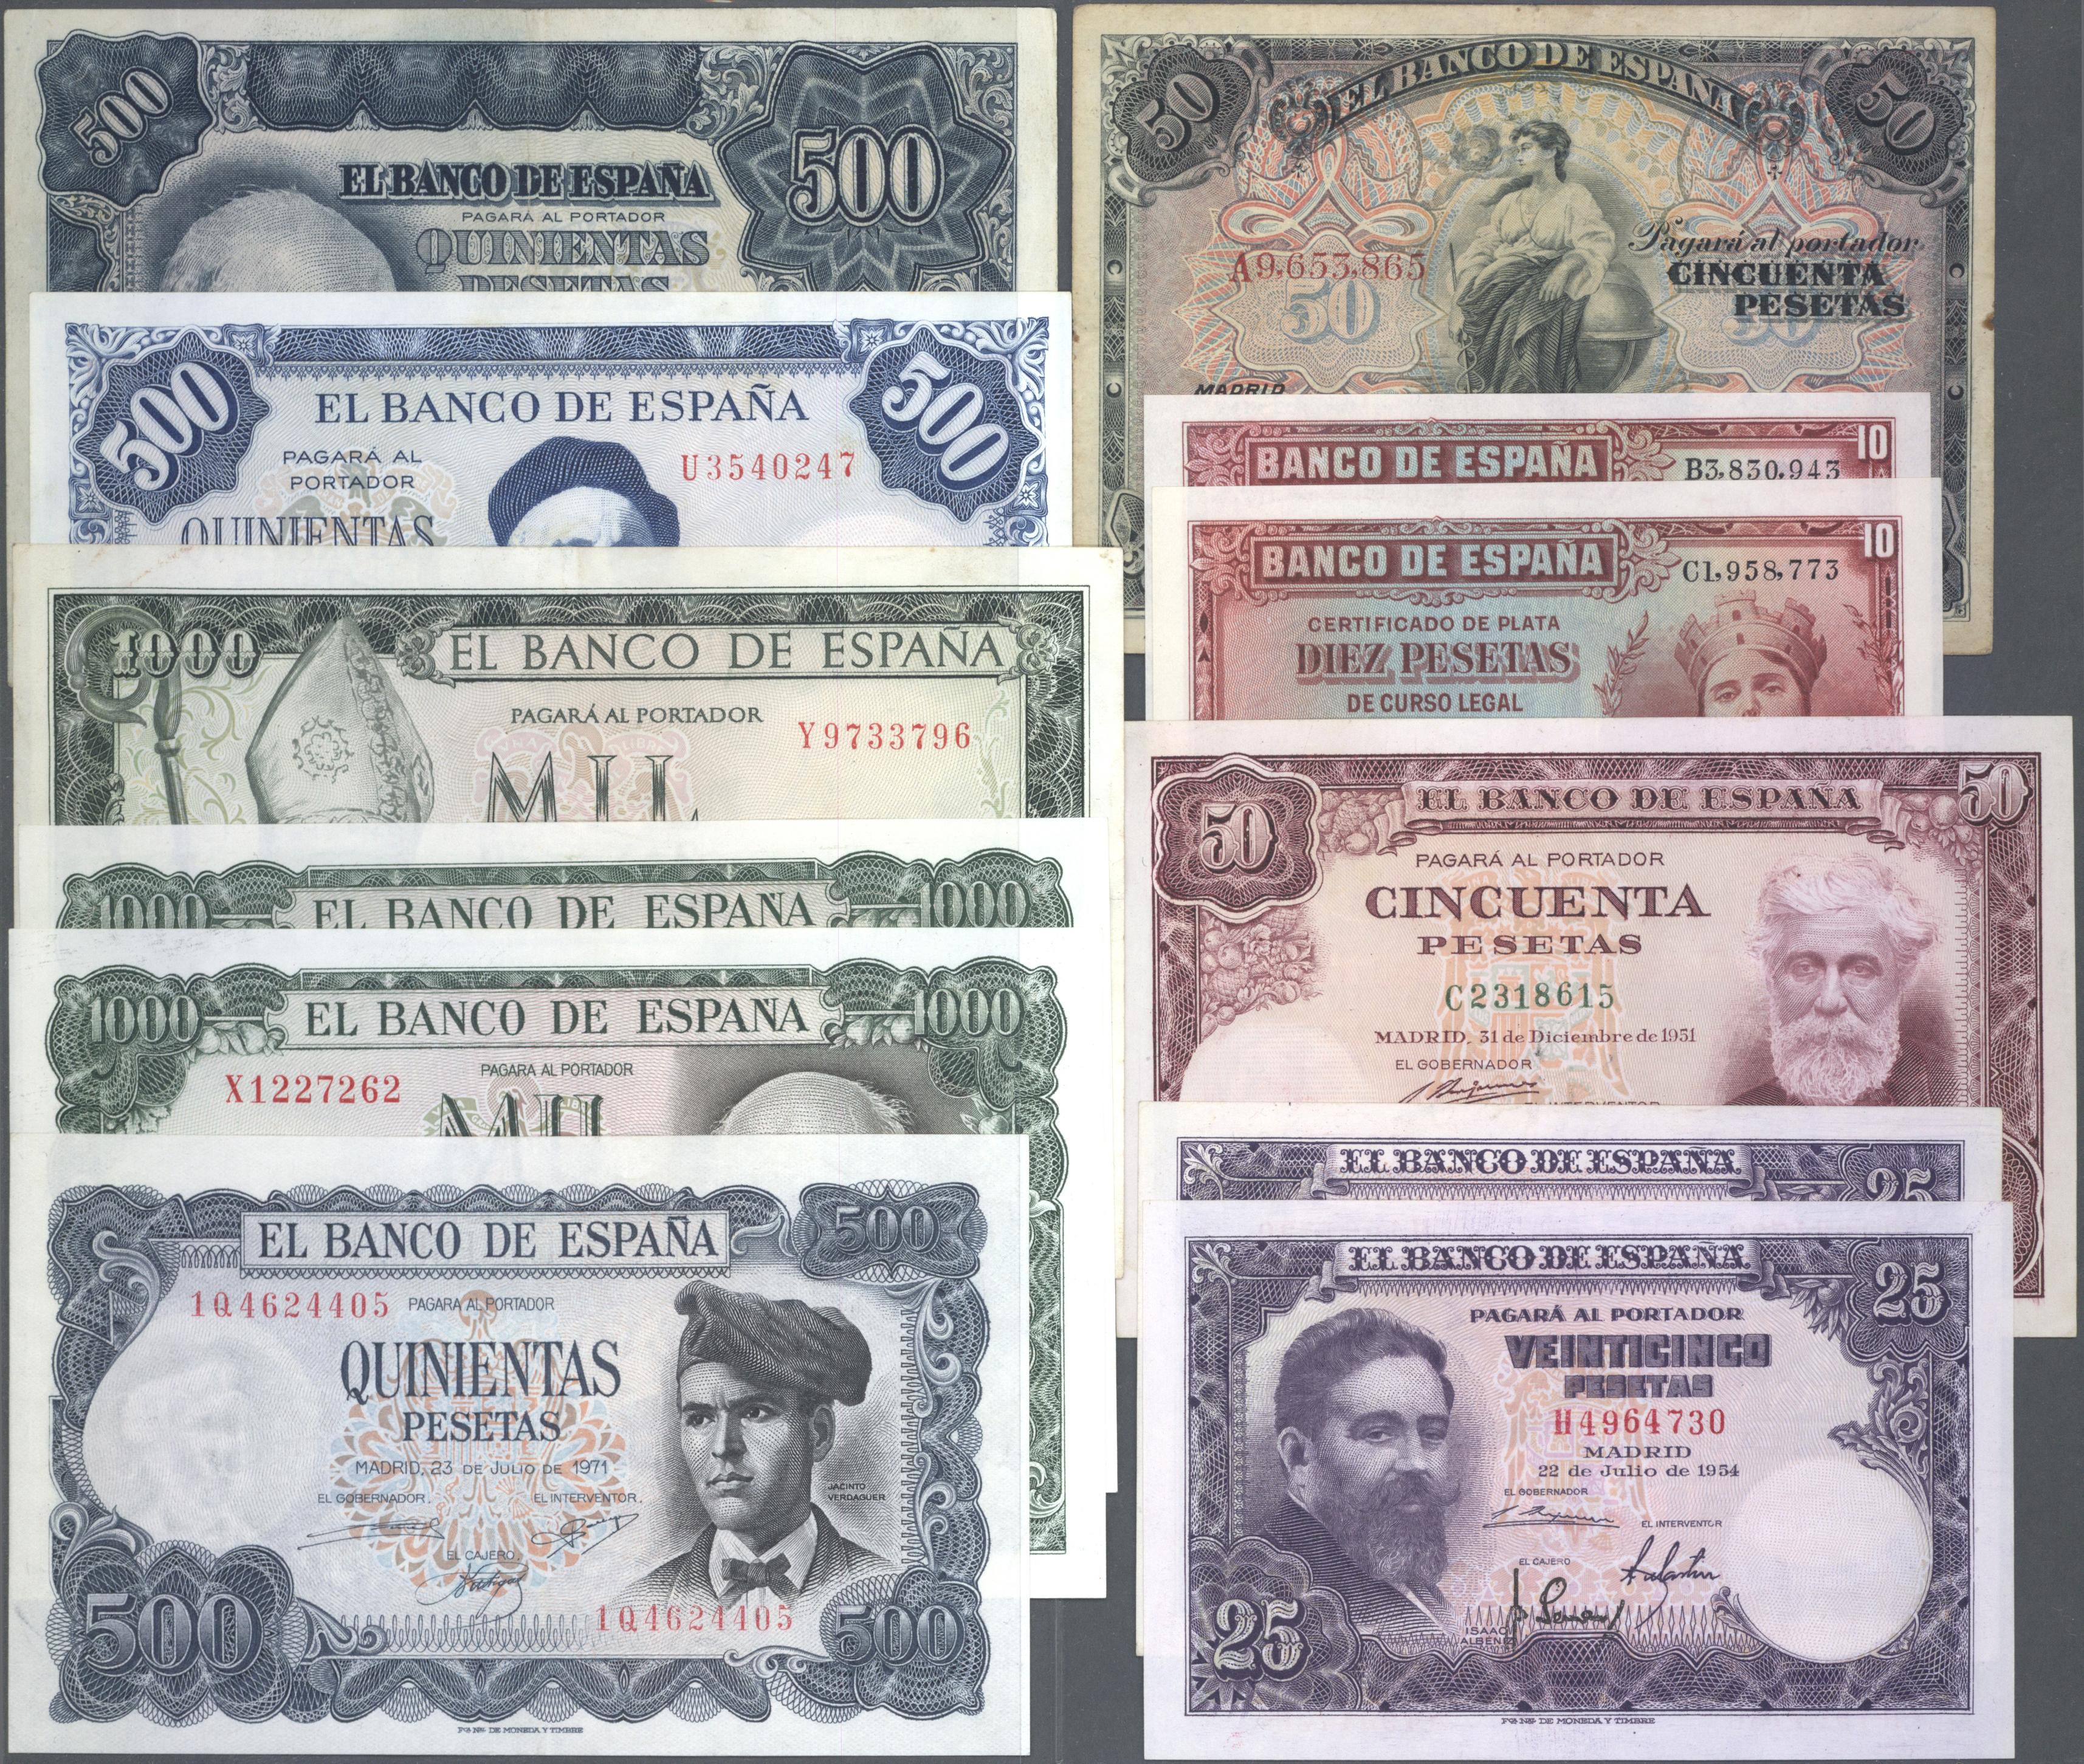 Lot 01549 - Spain / Spanien | Banknoten  -  Auktionshaus Christoph Gärtner GmbH & Co. KG Sale #46 The Banknotes Worldwide section of the 46th Christoph Gärtner Auction